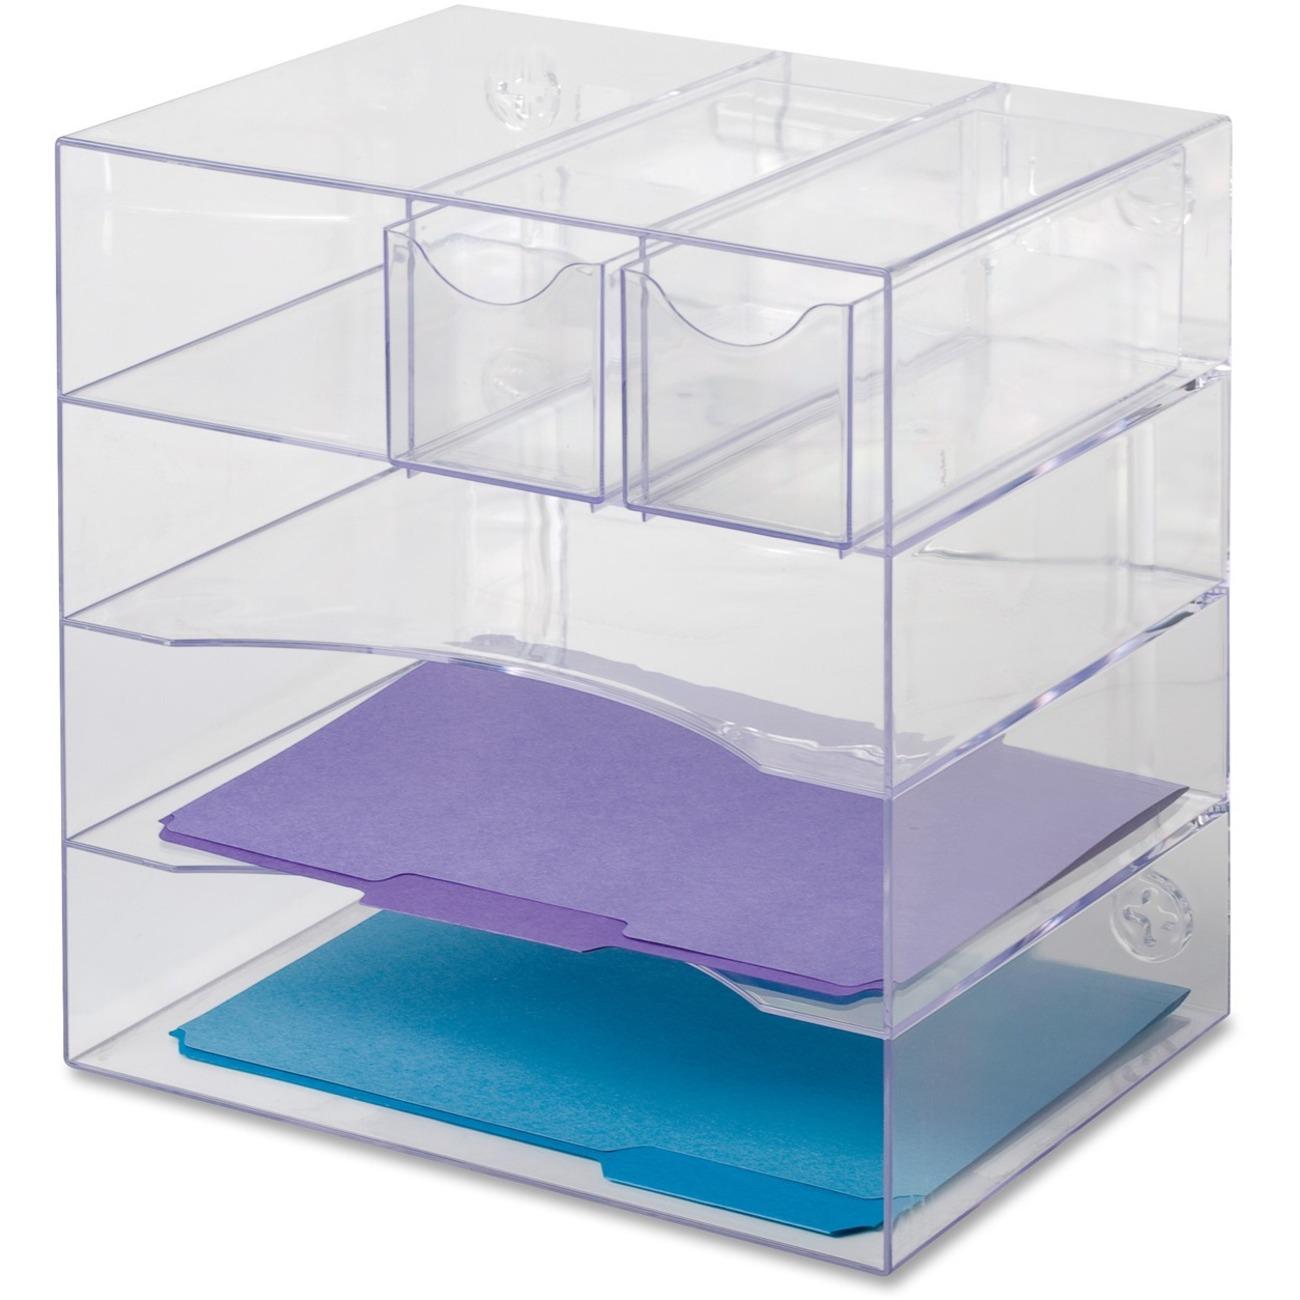 Ocean Stationery And Office Supplies Desk Organizers Desktop Holders Rubbermaid Optimizer